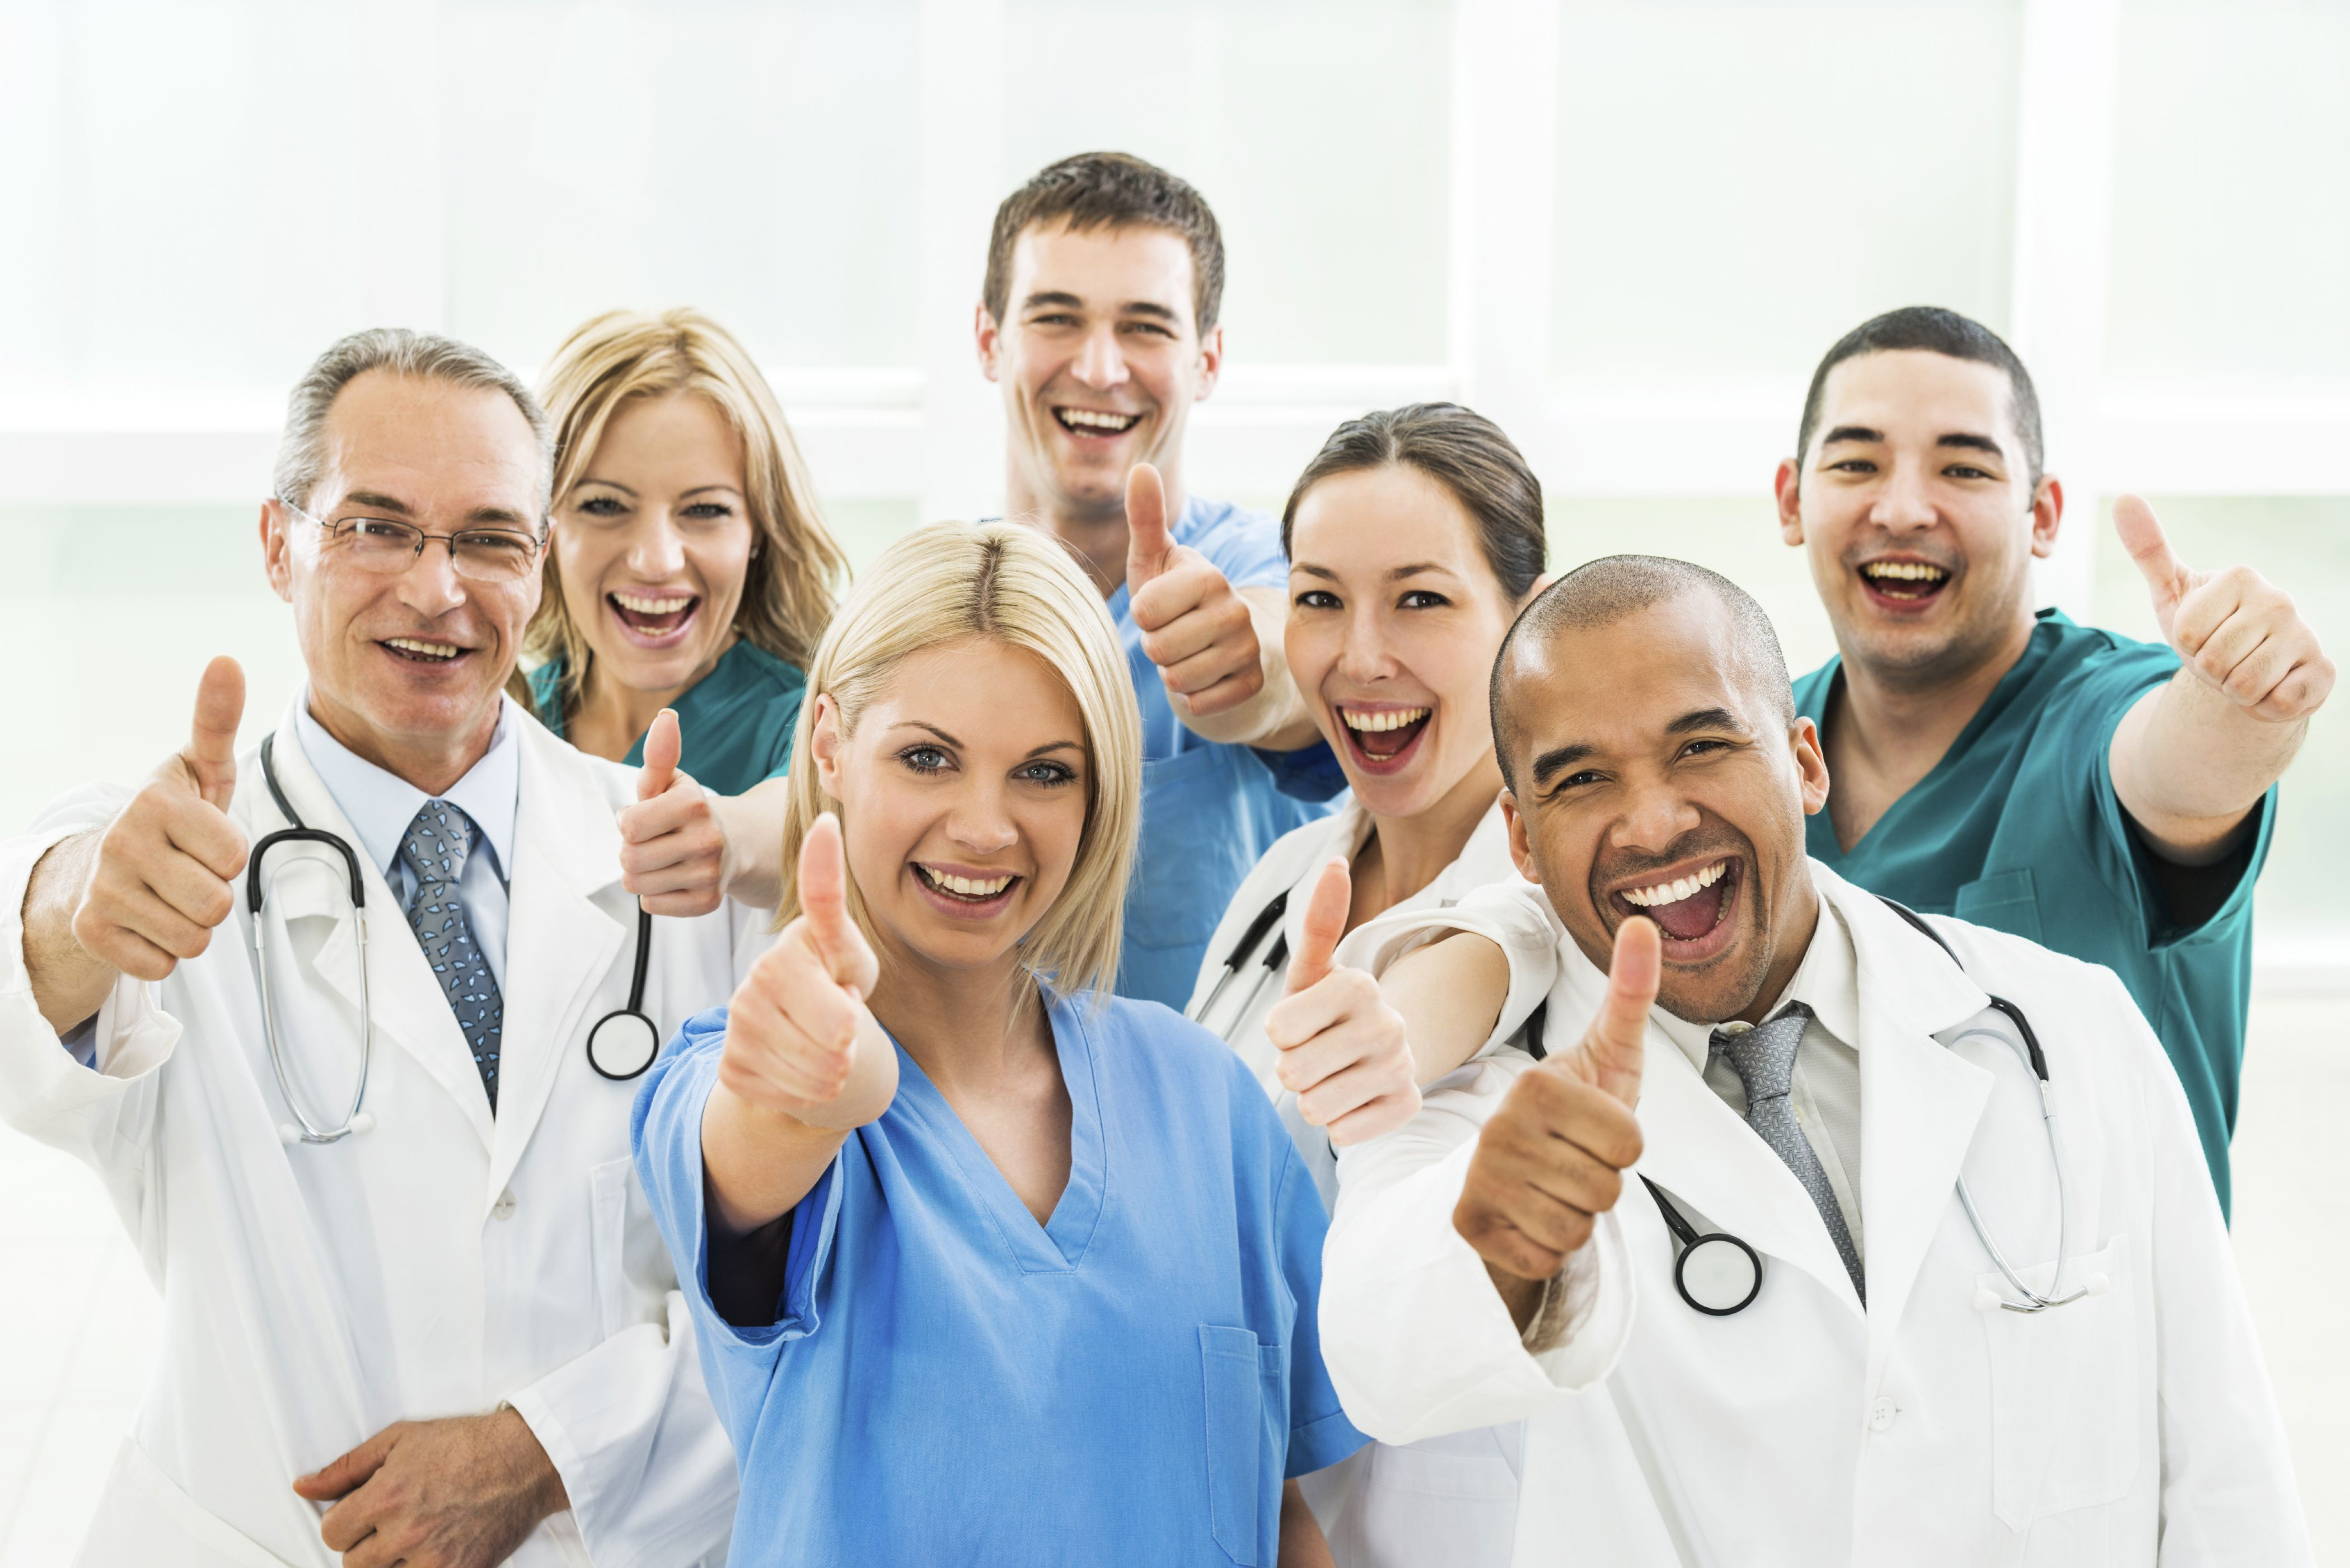 Clinicians smiling at camera 02